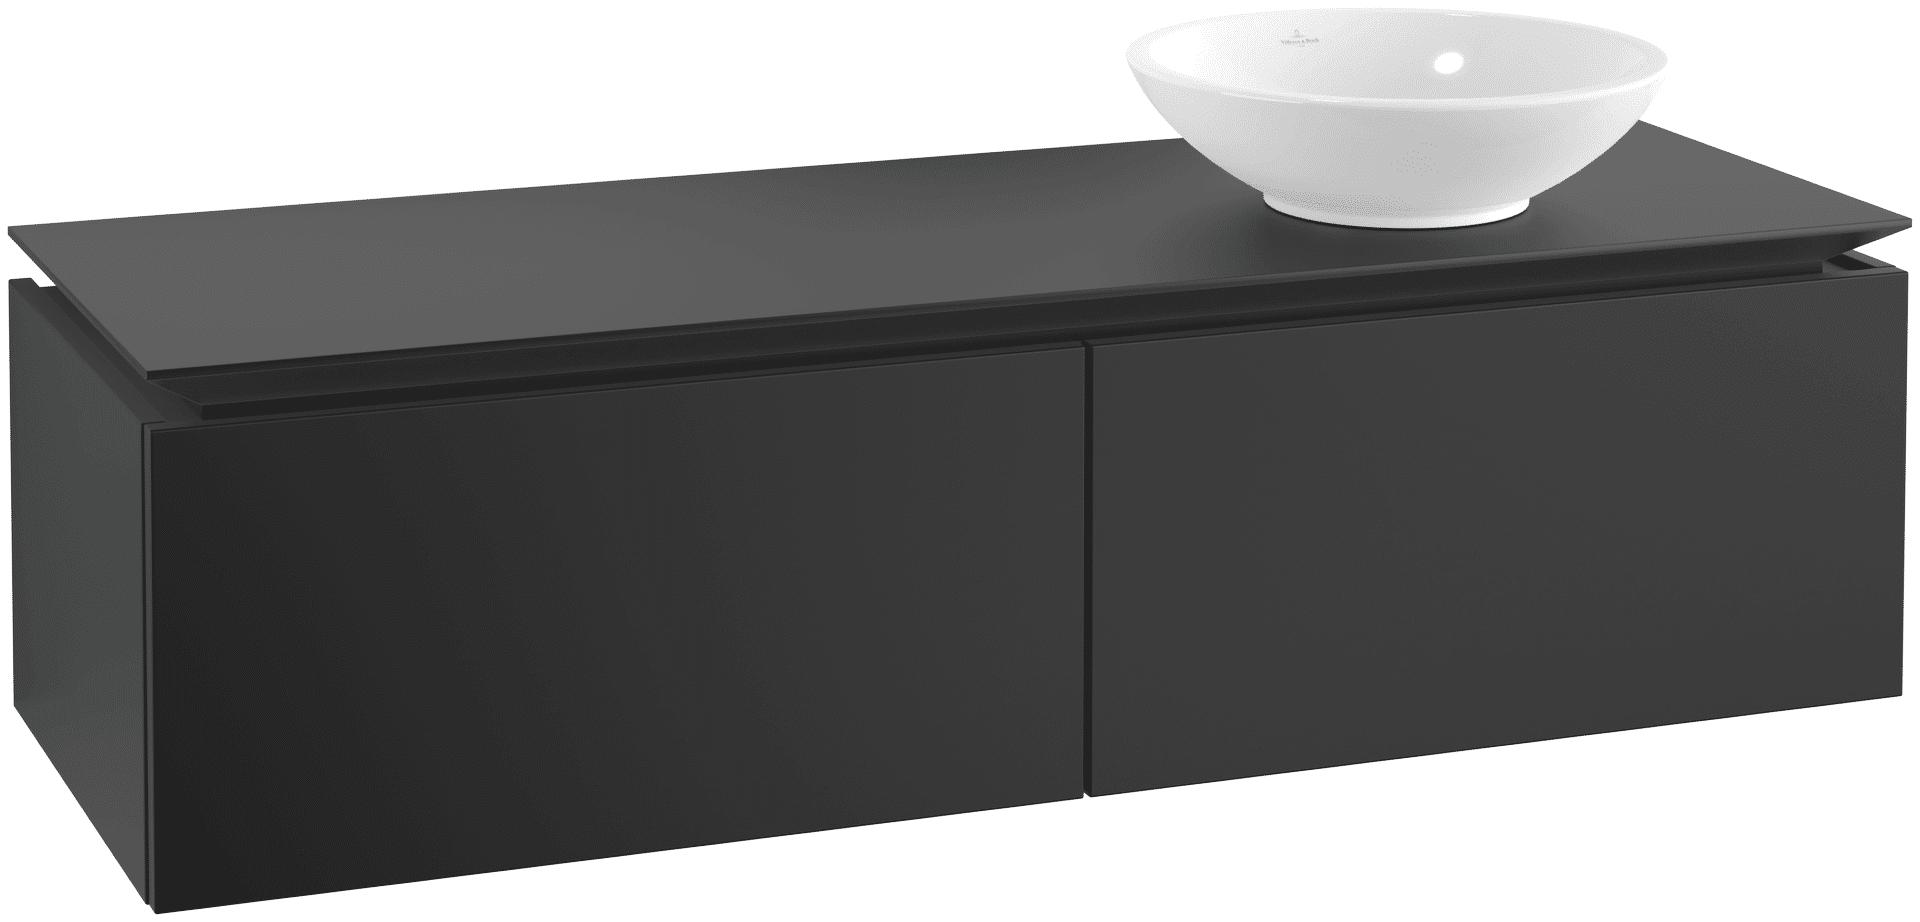 Villeroy & Boch Villeroy & Boch Legato - Meuble sous lavabo with 2 drawers & 1 cut-out right 1400 x 380 x 500mm noir mat